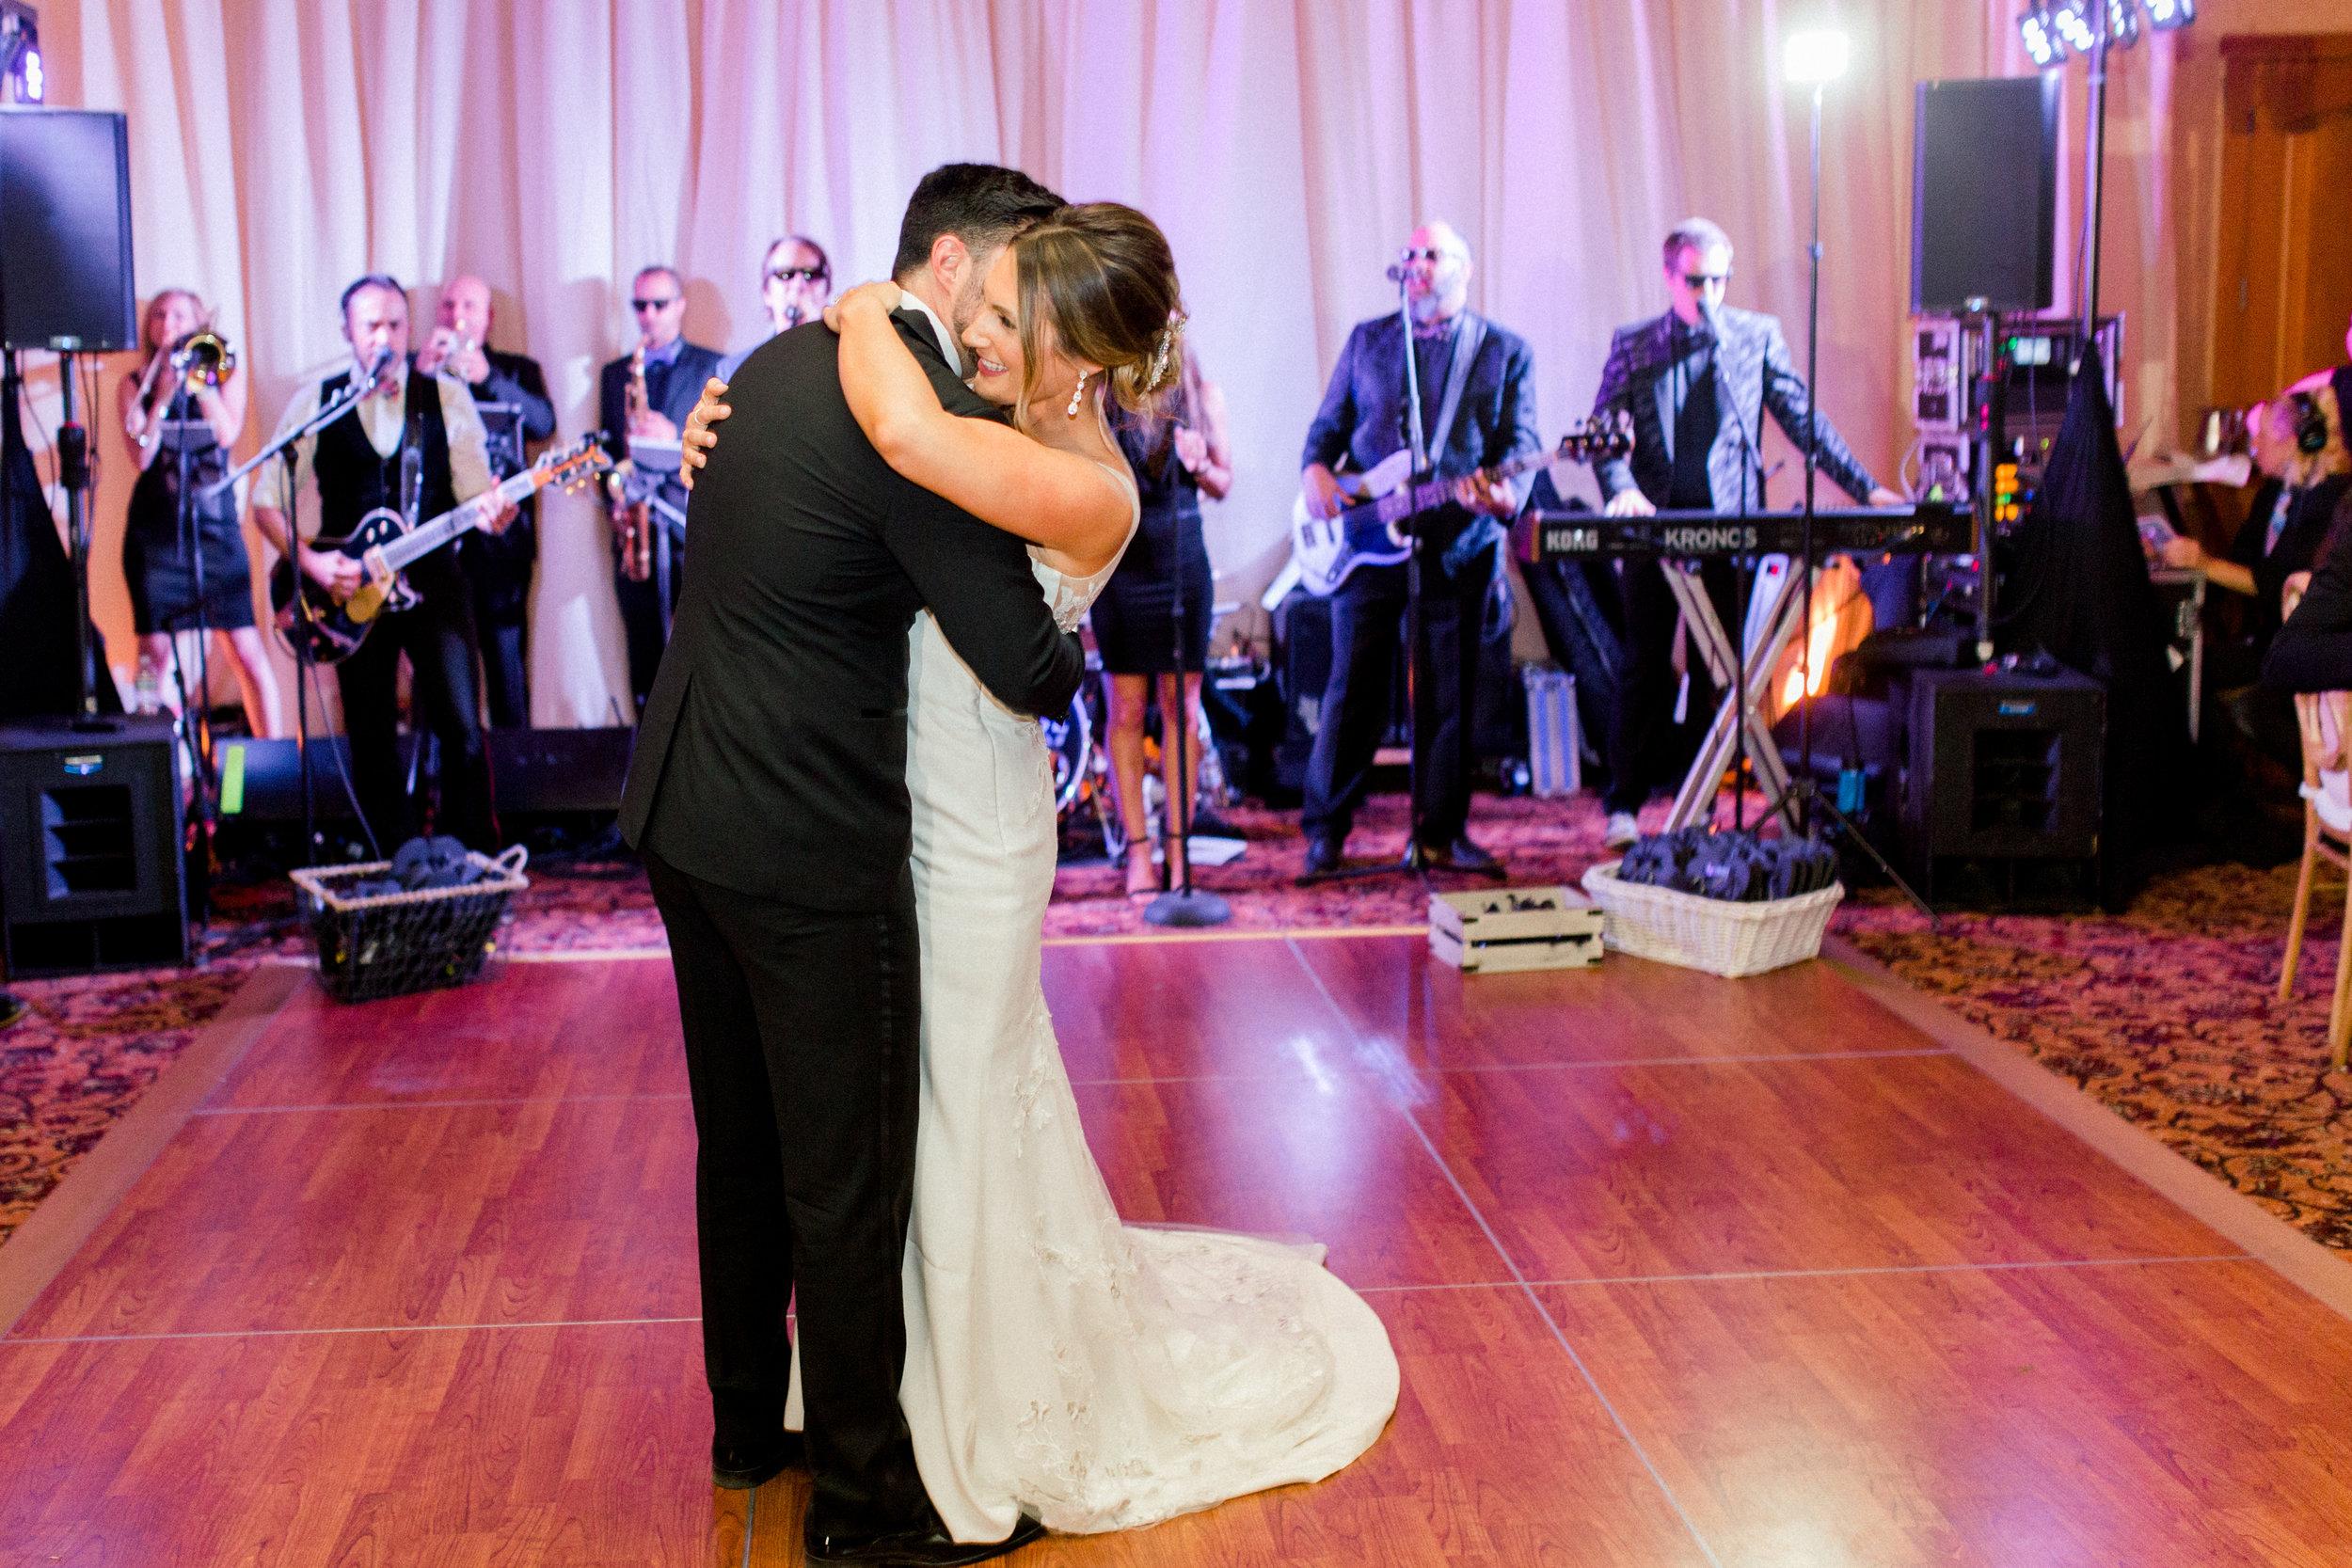 vintners-inn-wedding-in-santa-rosa-california-108.jpg